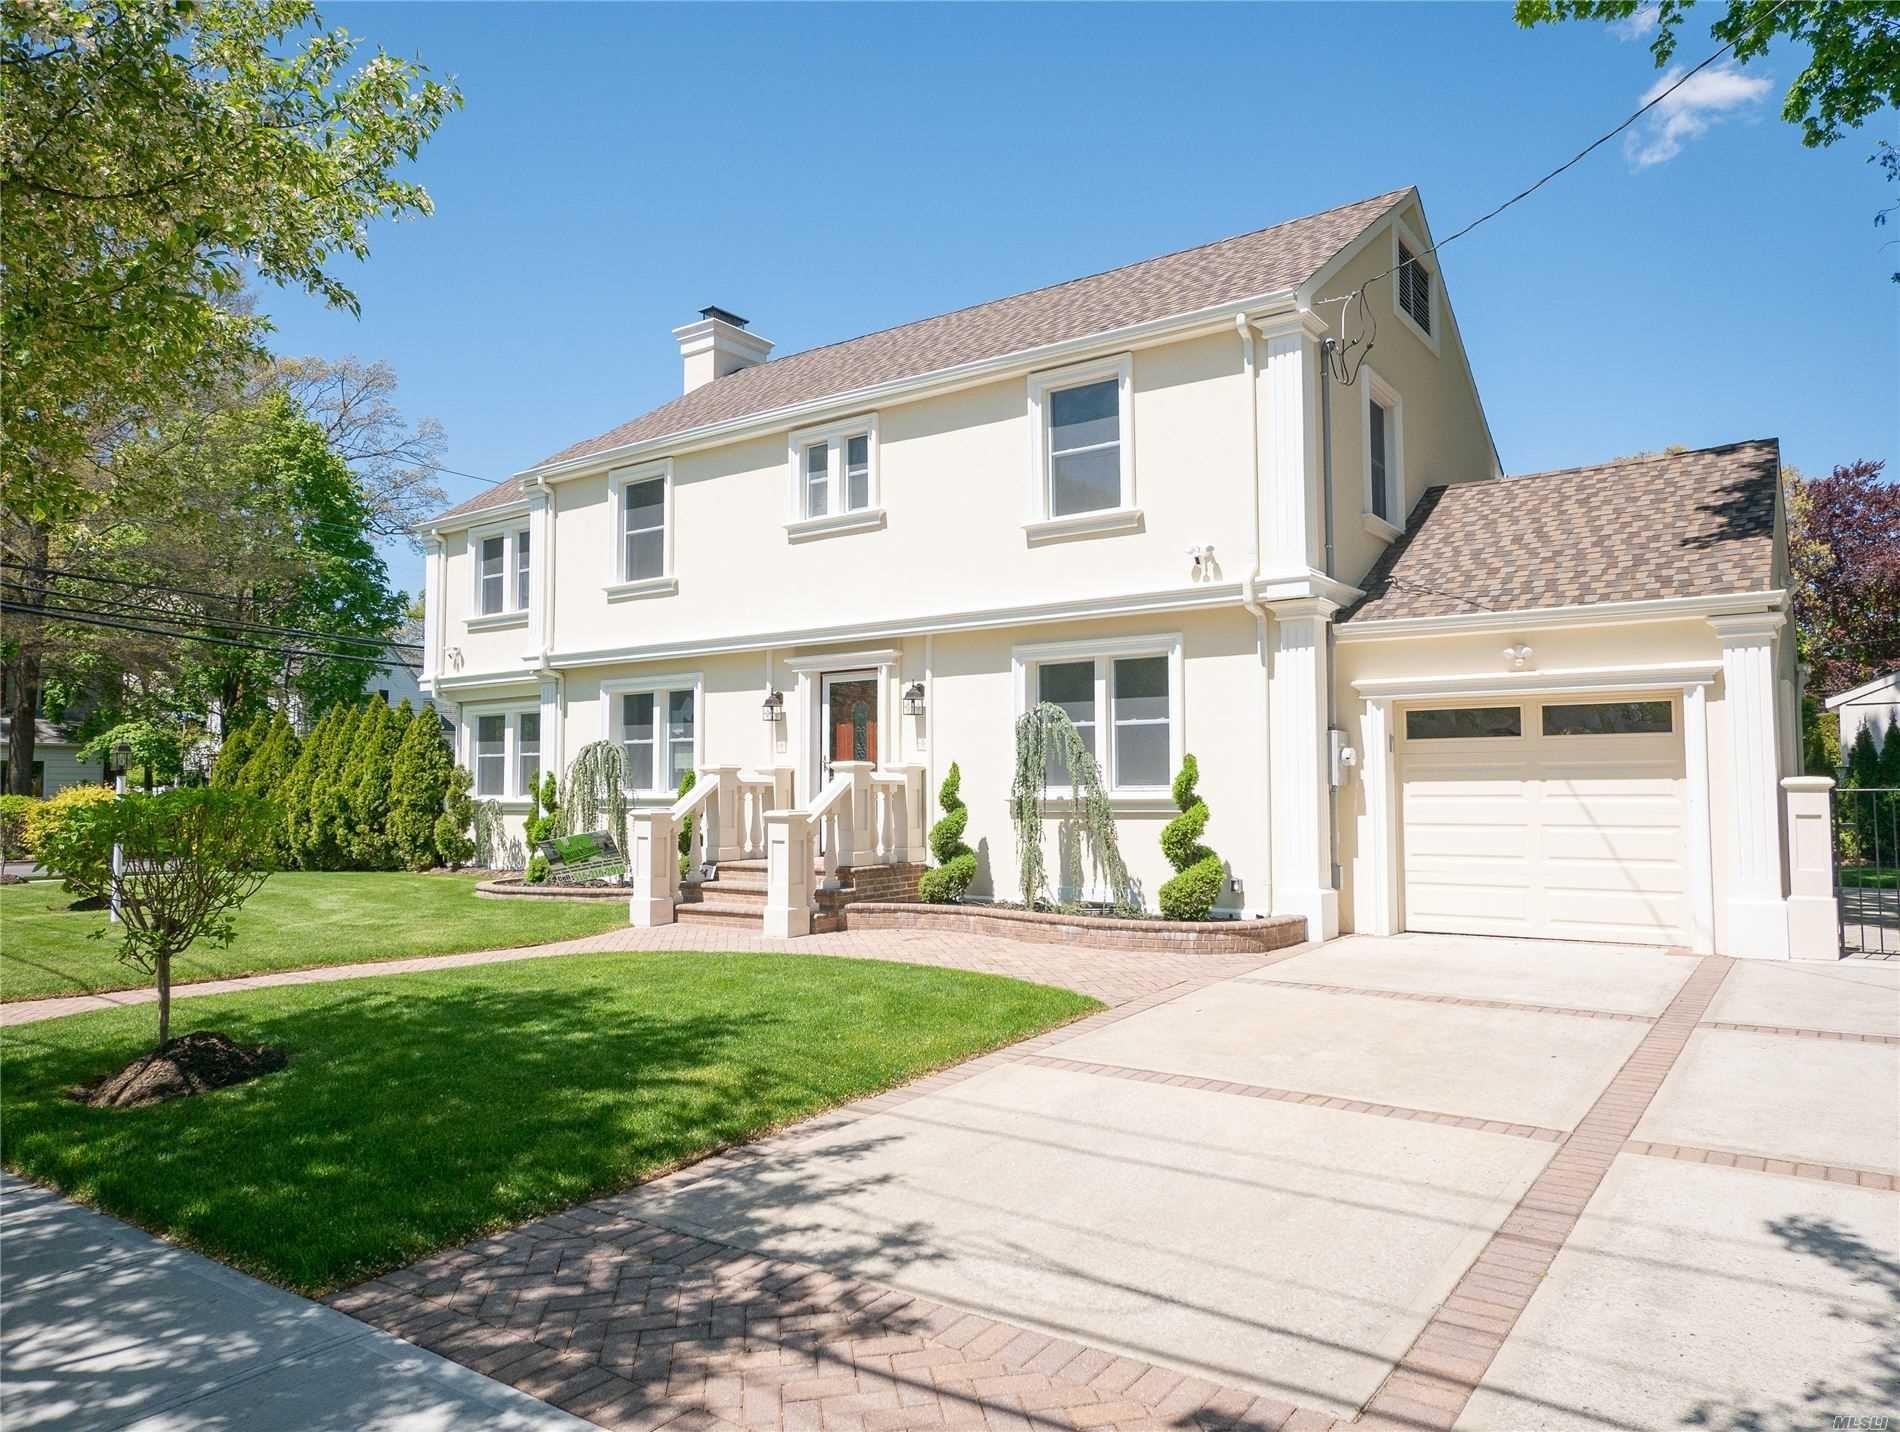 94 Home St, Malverne, NY 11565 - MLS#: 3219696